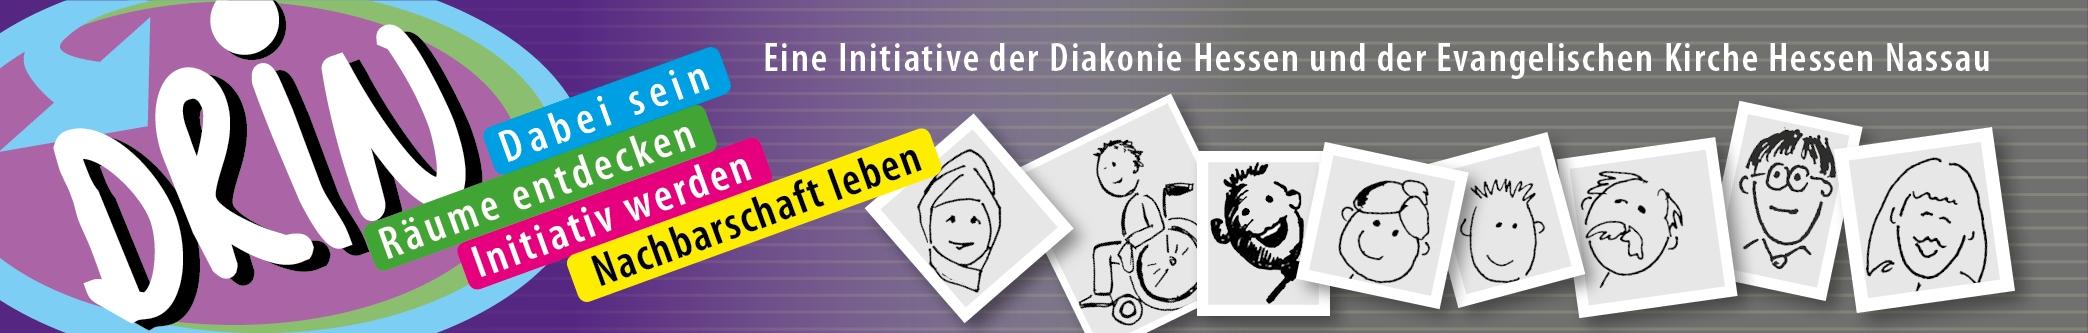 http://drin-projekt.ekhn.de/fileadmin/content/drin/download/Banner/Banner.jpg